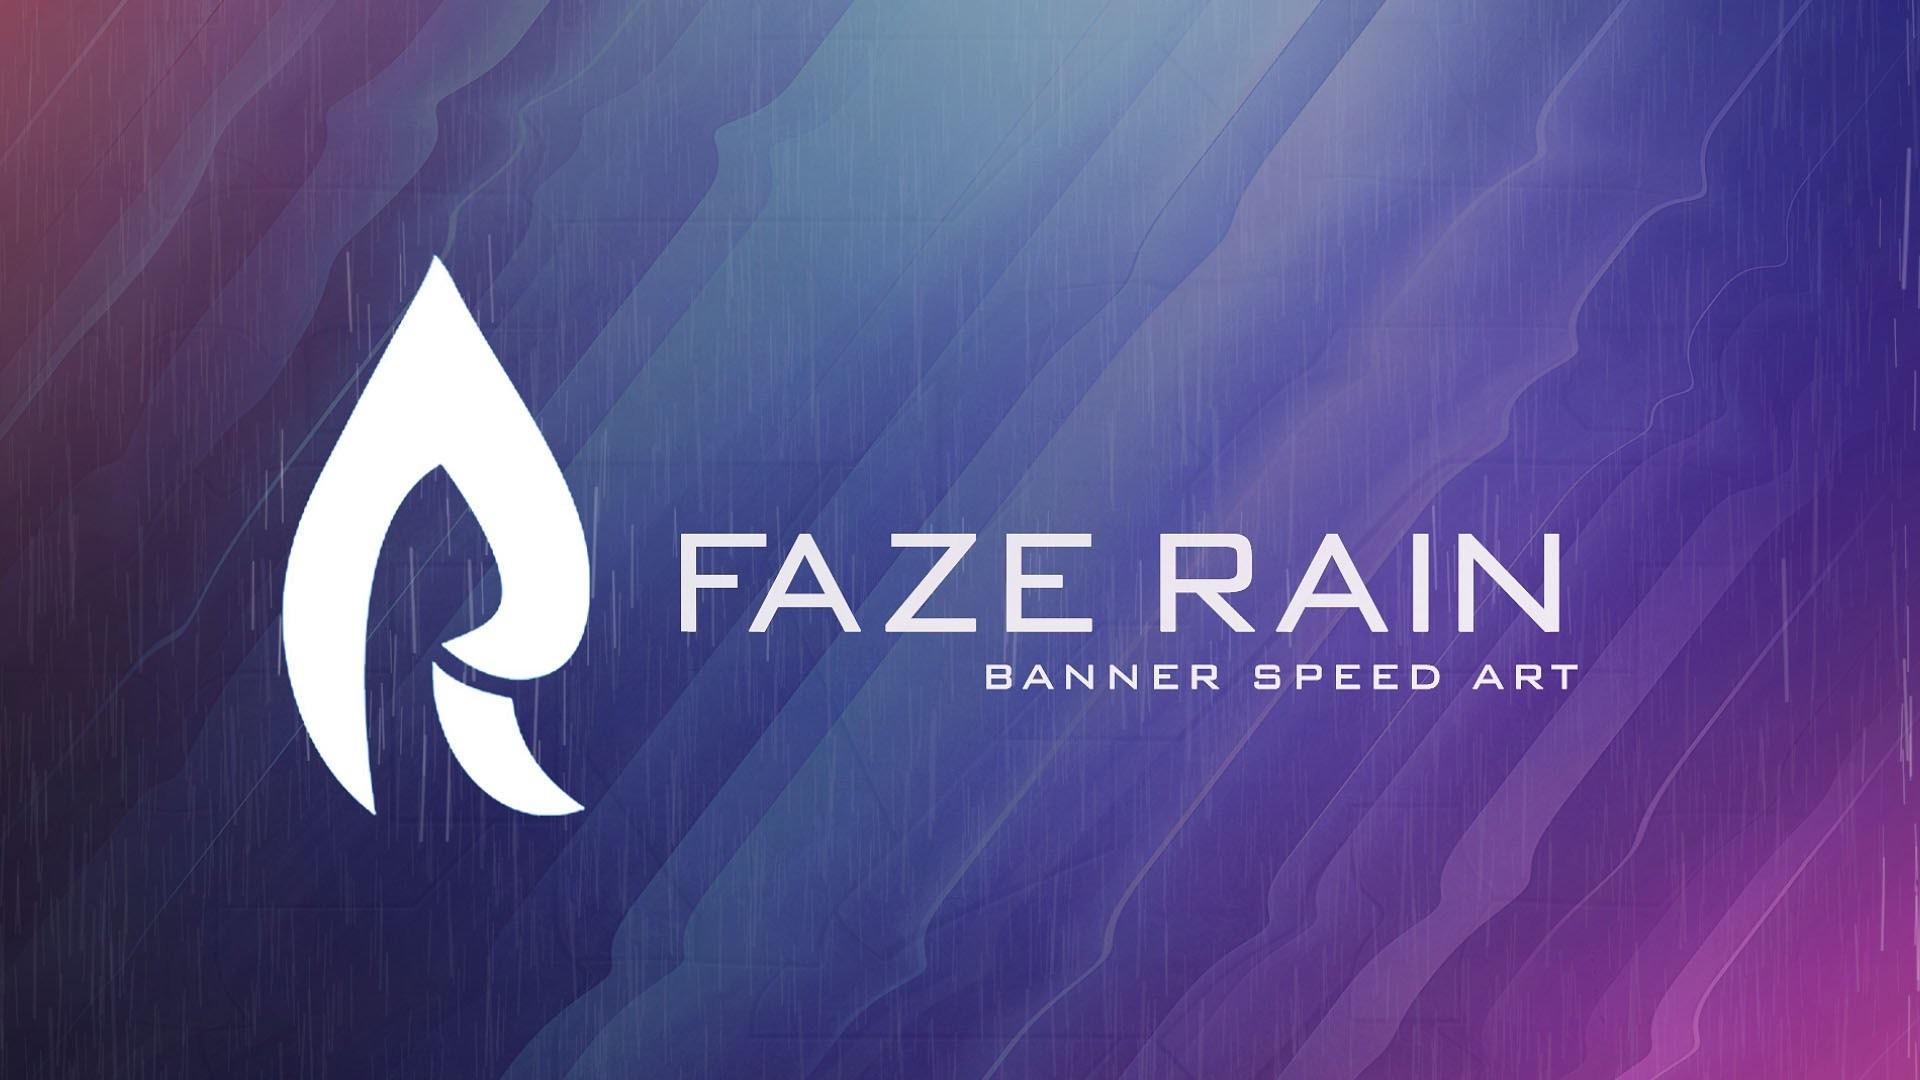 FaZe Rain Banner Speed Art – YouTube